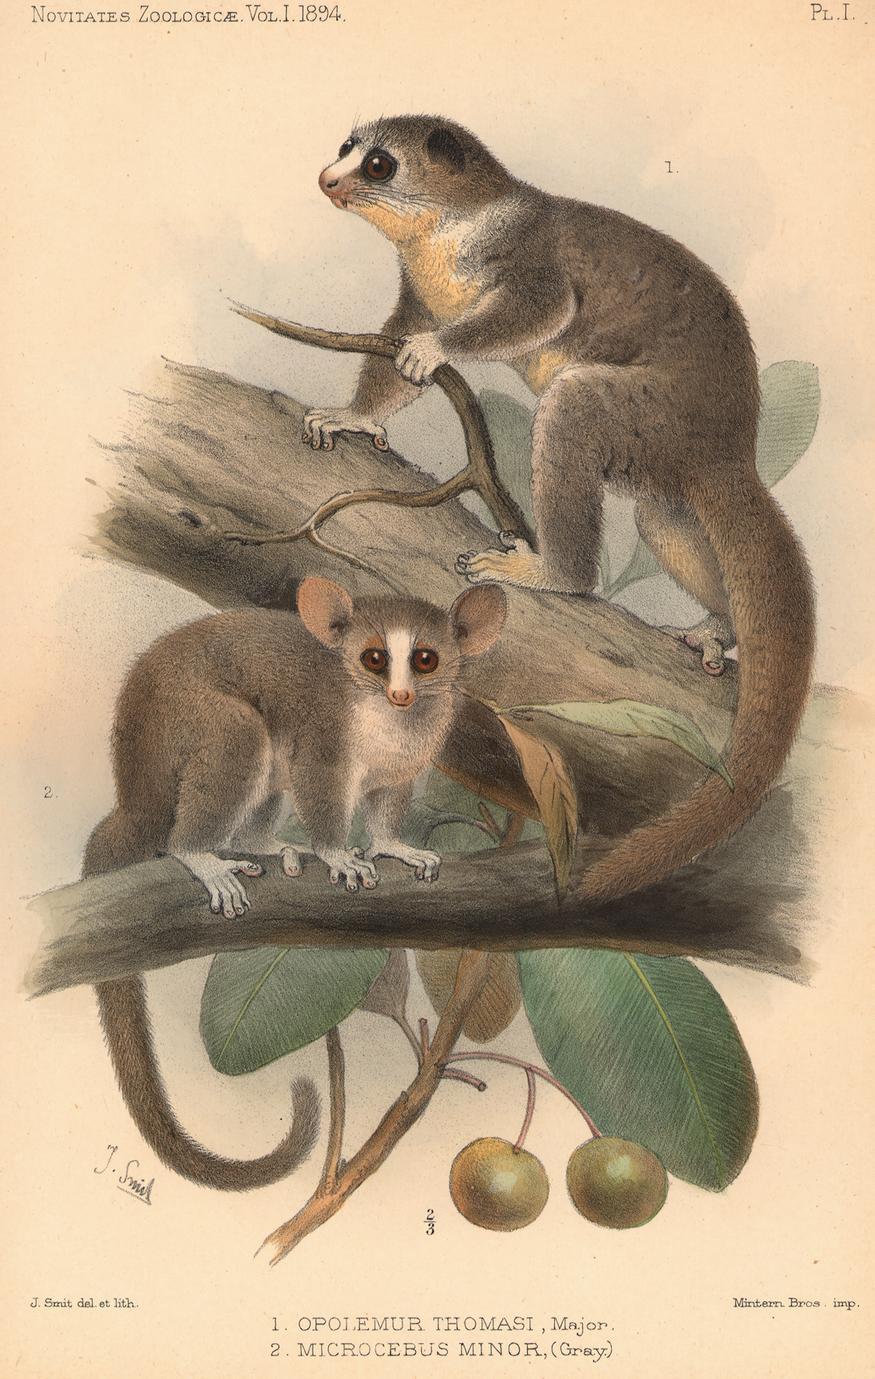 1. Opolemur thomasi, major; 2. Microcebus minor, (Gray.)